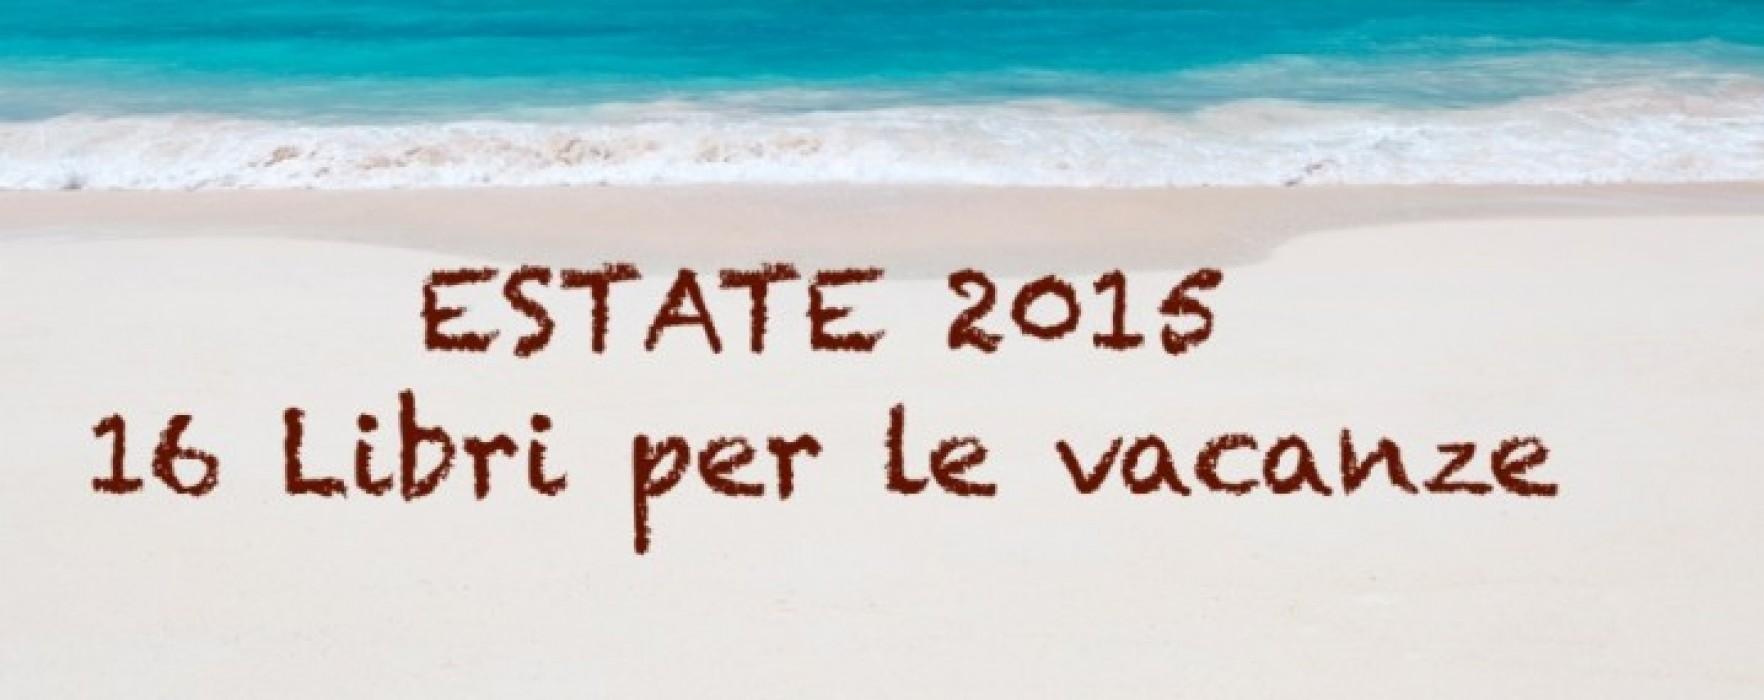 Estate 2015: 16 libri da leggere in vacanza